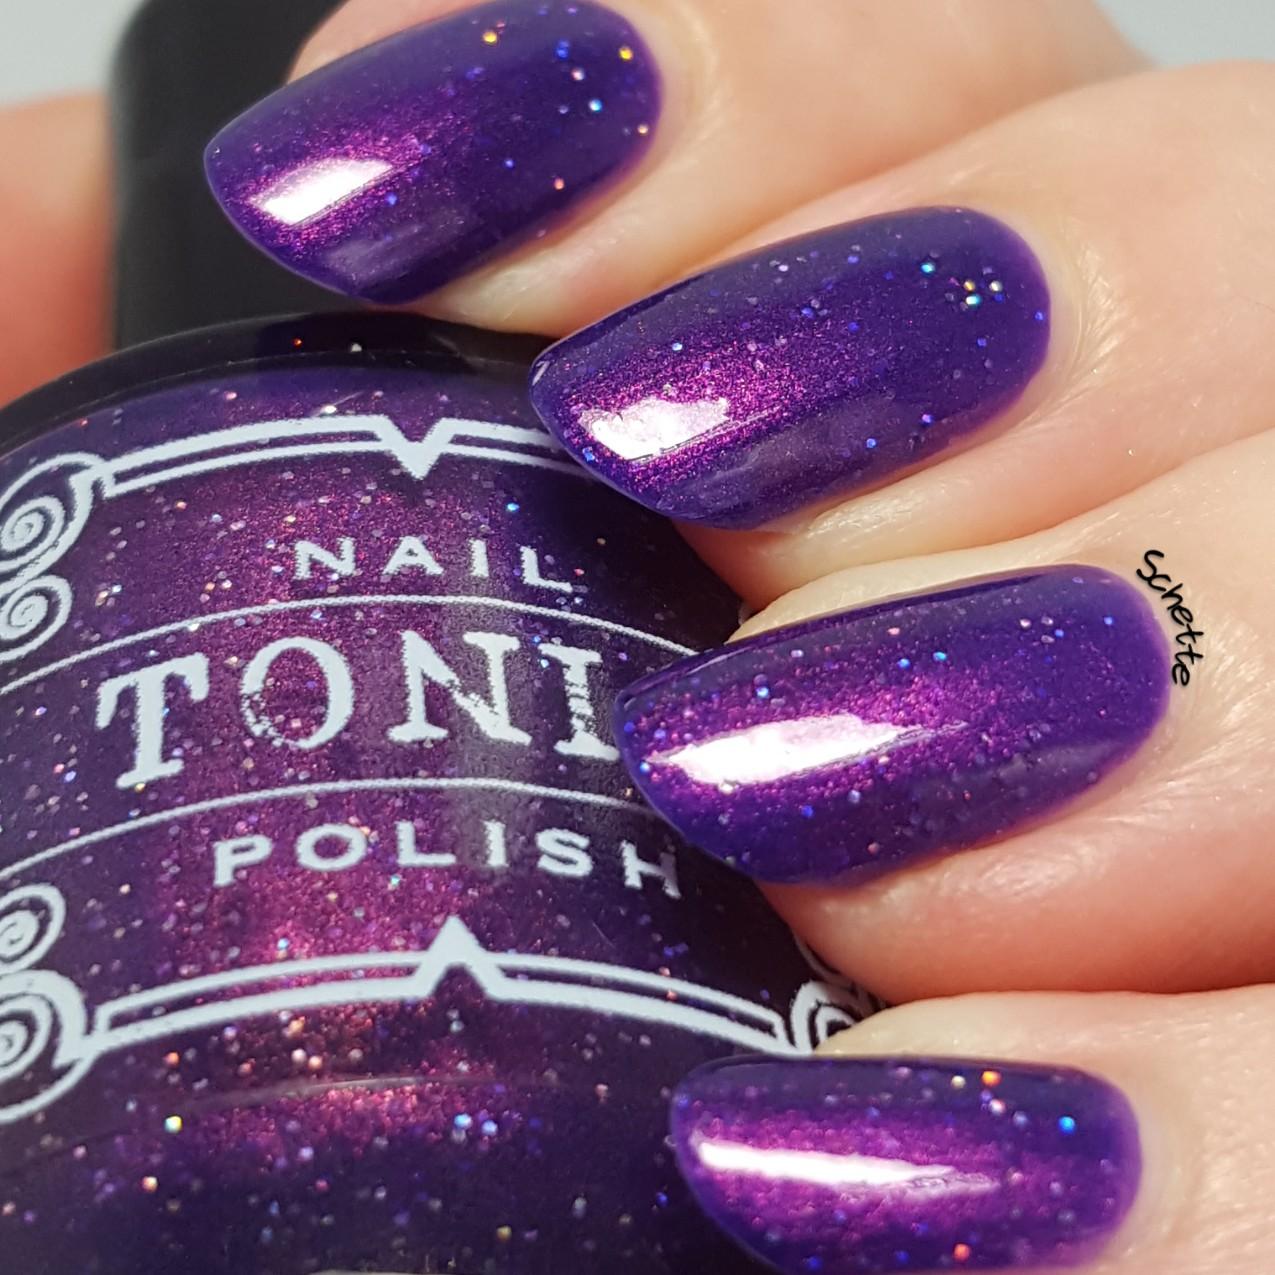 Tonic Polish - Huckleberry Sparkle